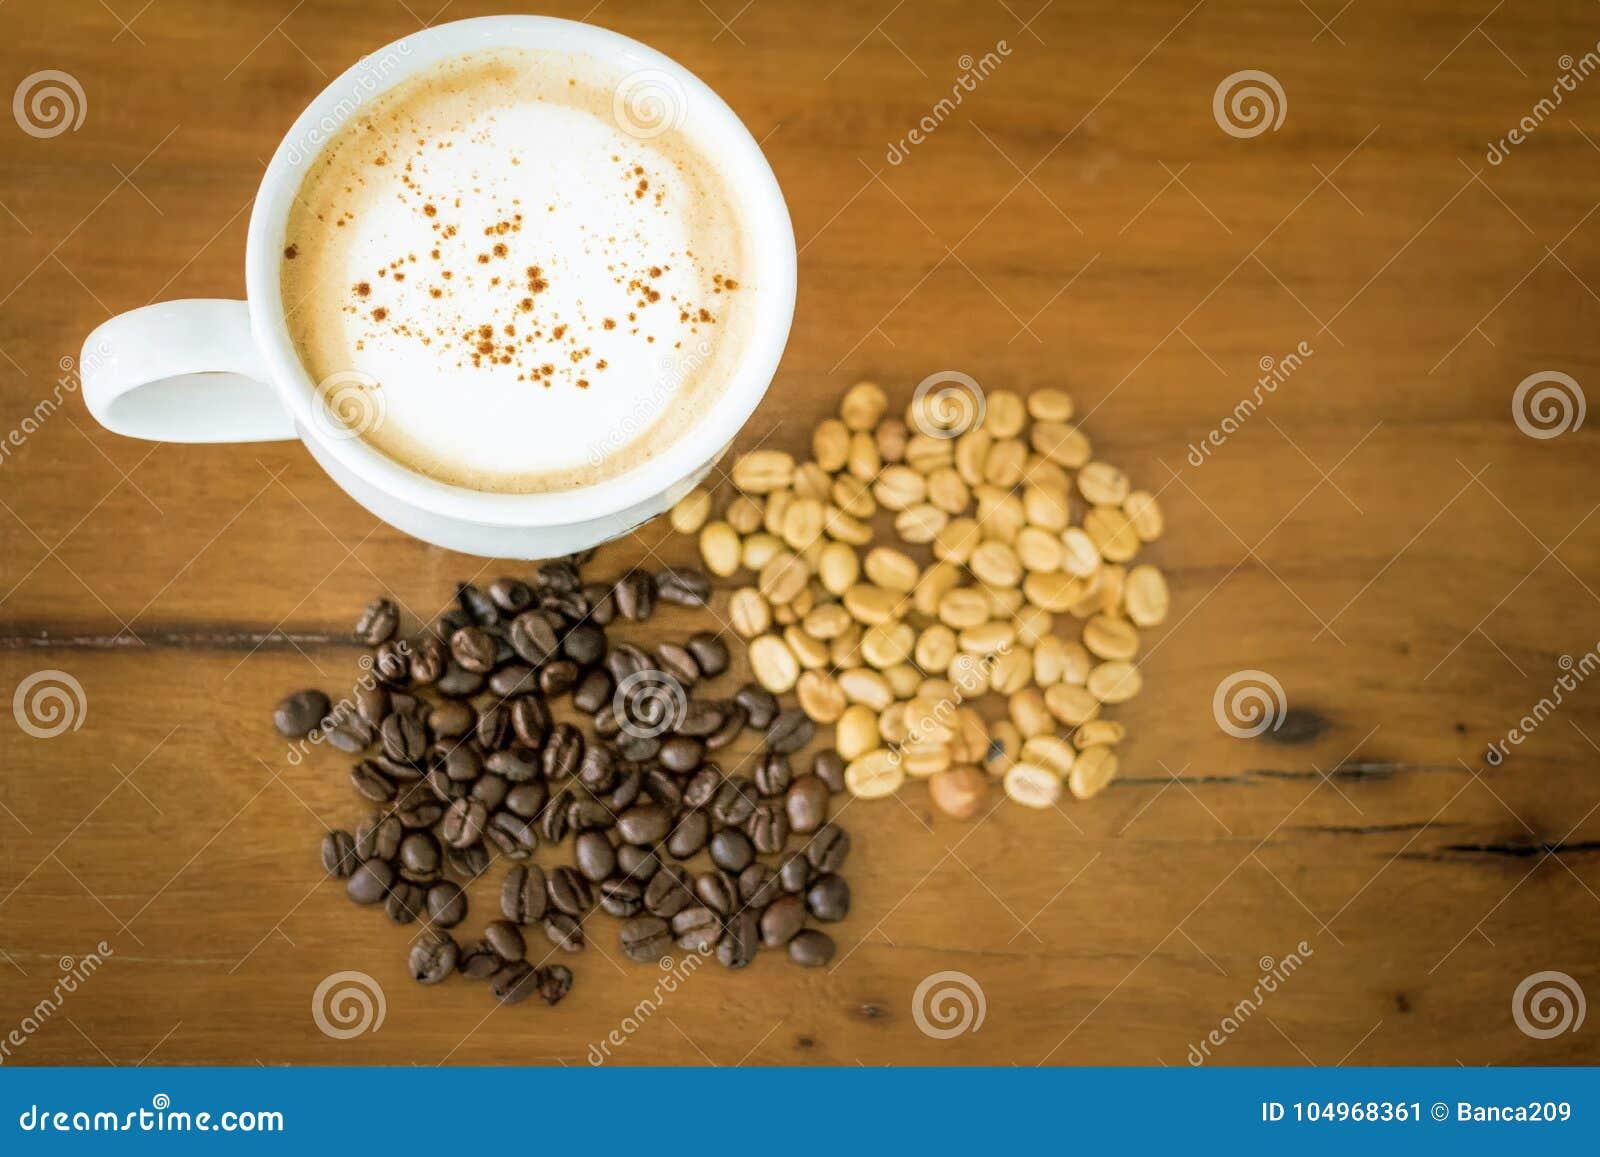 Thaise Organische de koffiearabica van de olifants shit koffie